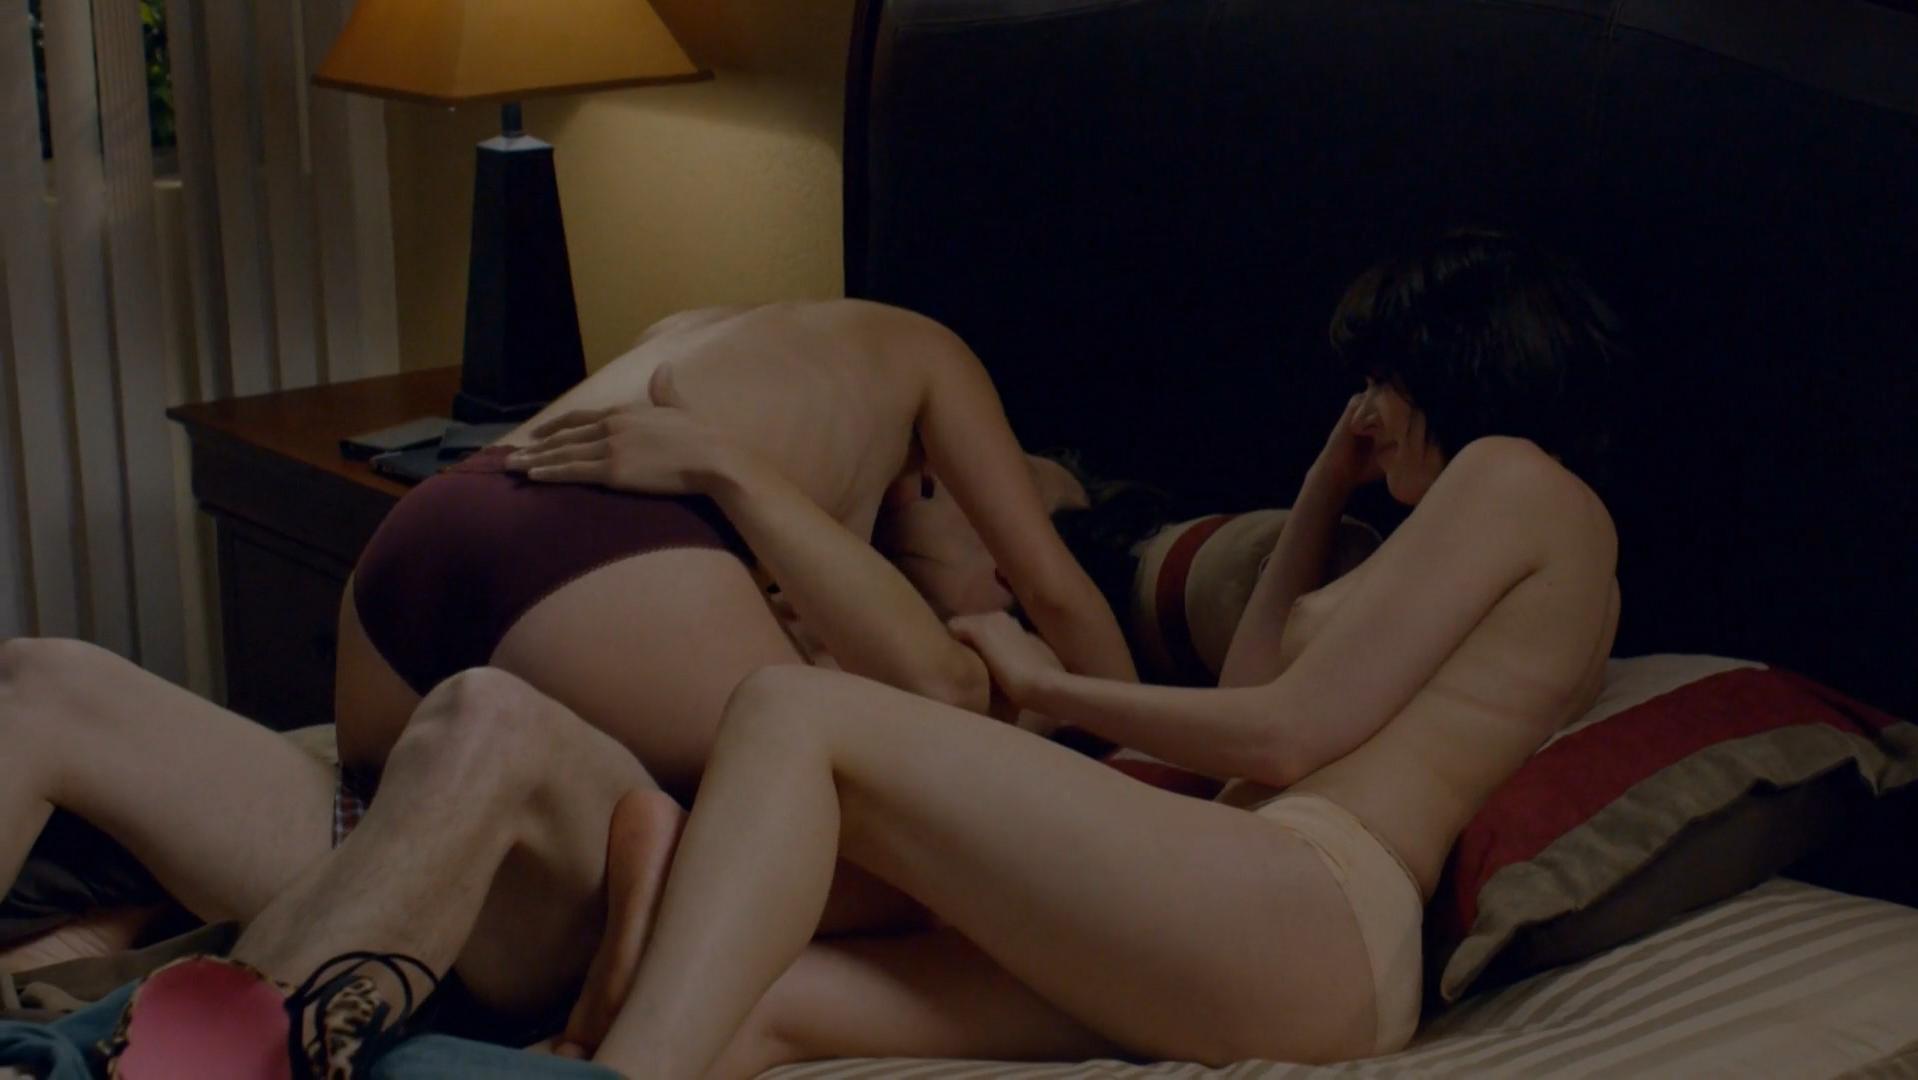 Emily Sandifer nude, Jennifer Blakeslee nude - Love s01e01 (2016)